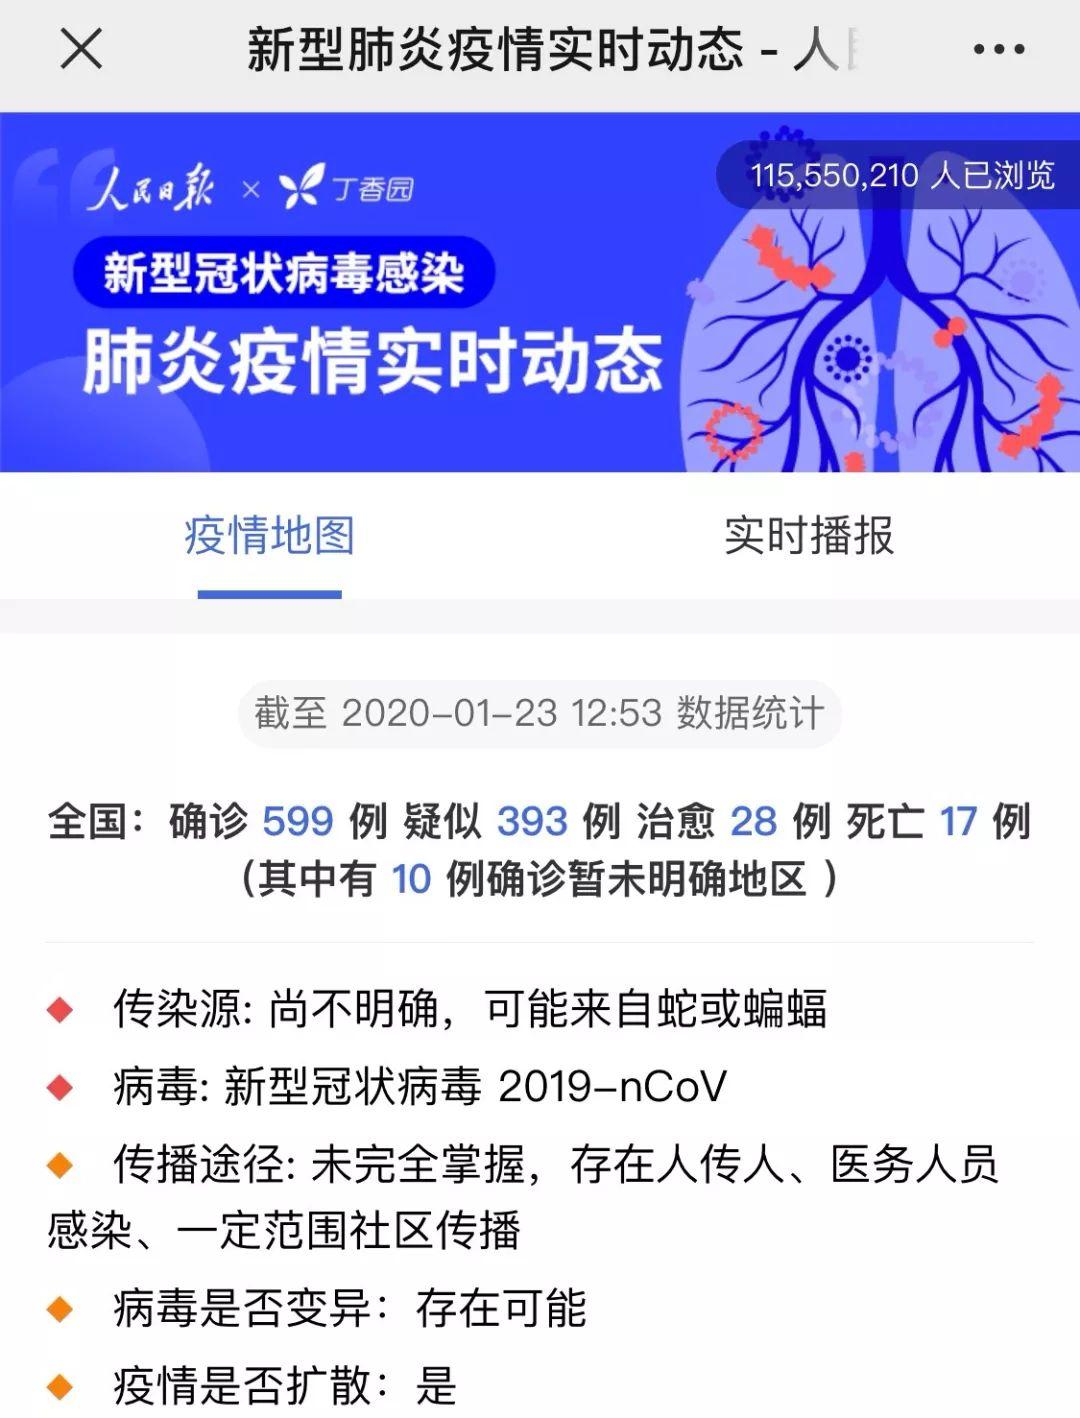 http://www.ningbofob.com/jiaoyuxuexi/45482.html